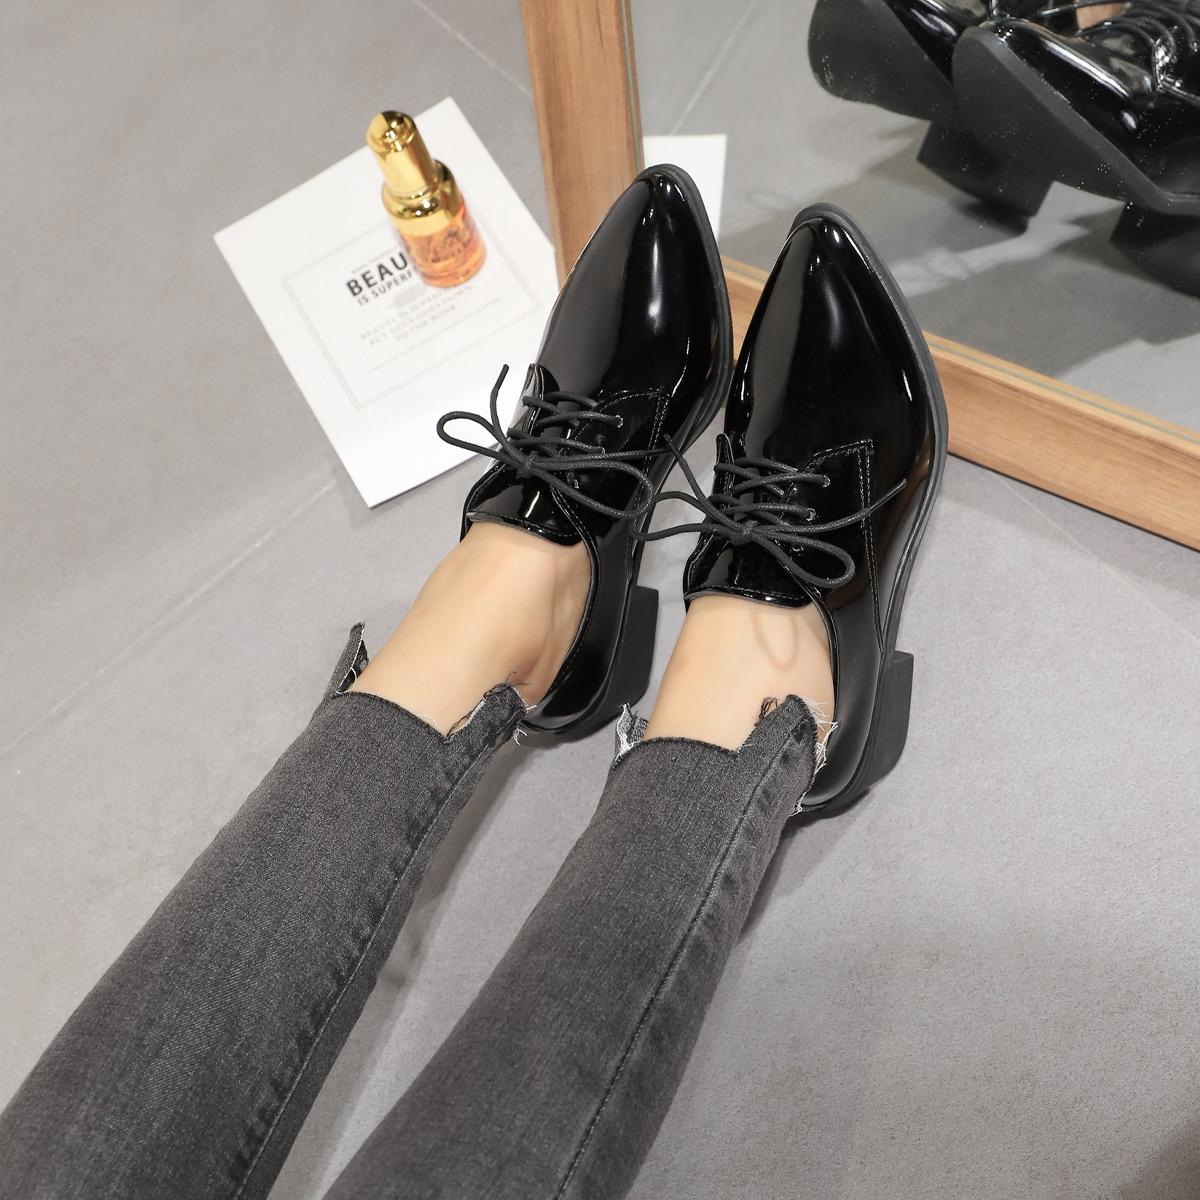 Zapatos oxford de punta con tacón grueso